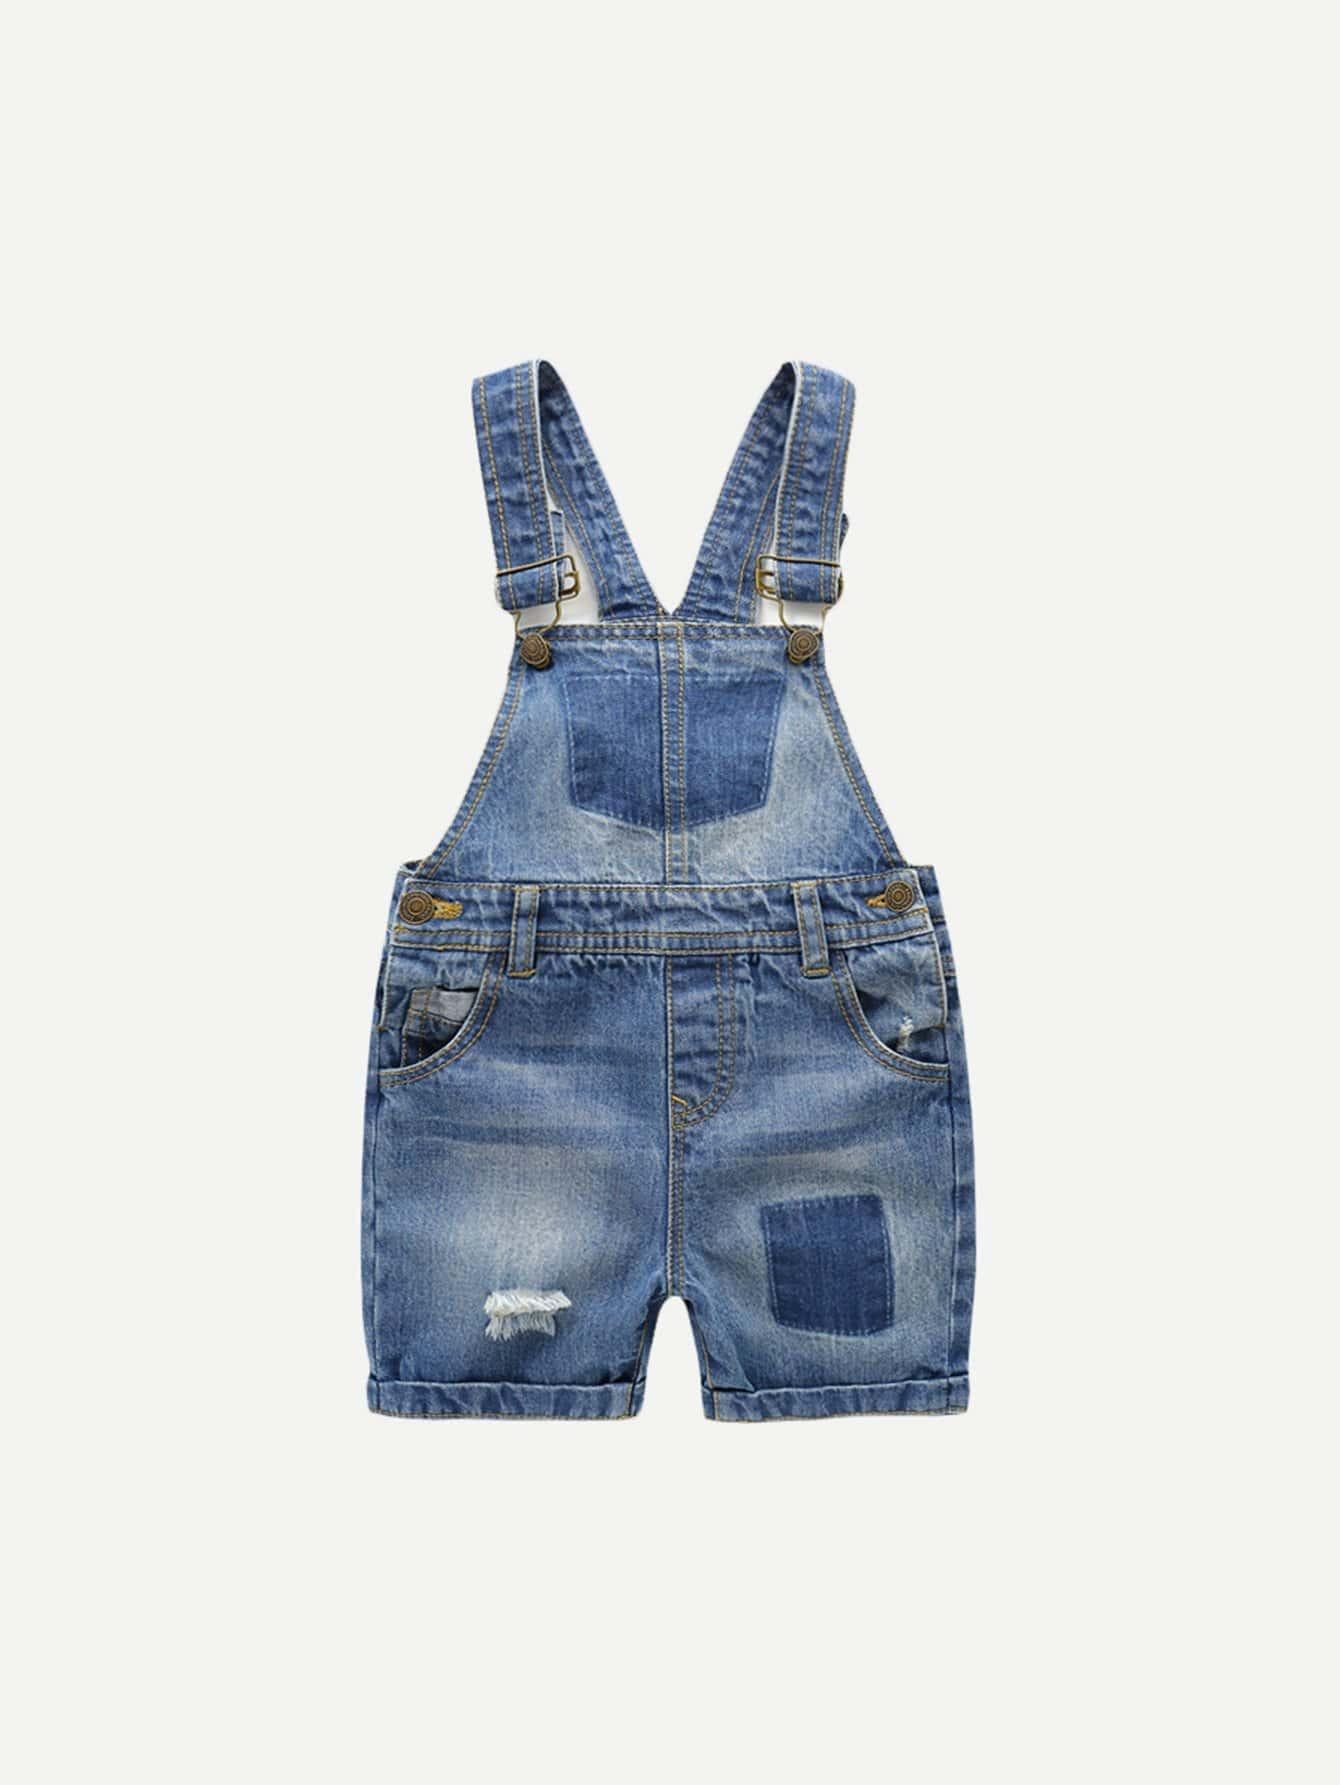 Kids Destroyed Cuffed Denim Overalls 2017 new spring autumn kids baby girls denim jeans pants infant denim girls overalls jumpsuit lovely jeans overalls teenagers